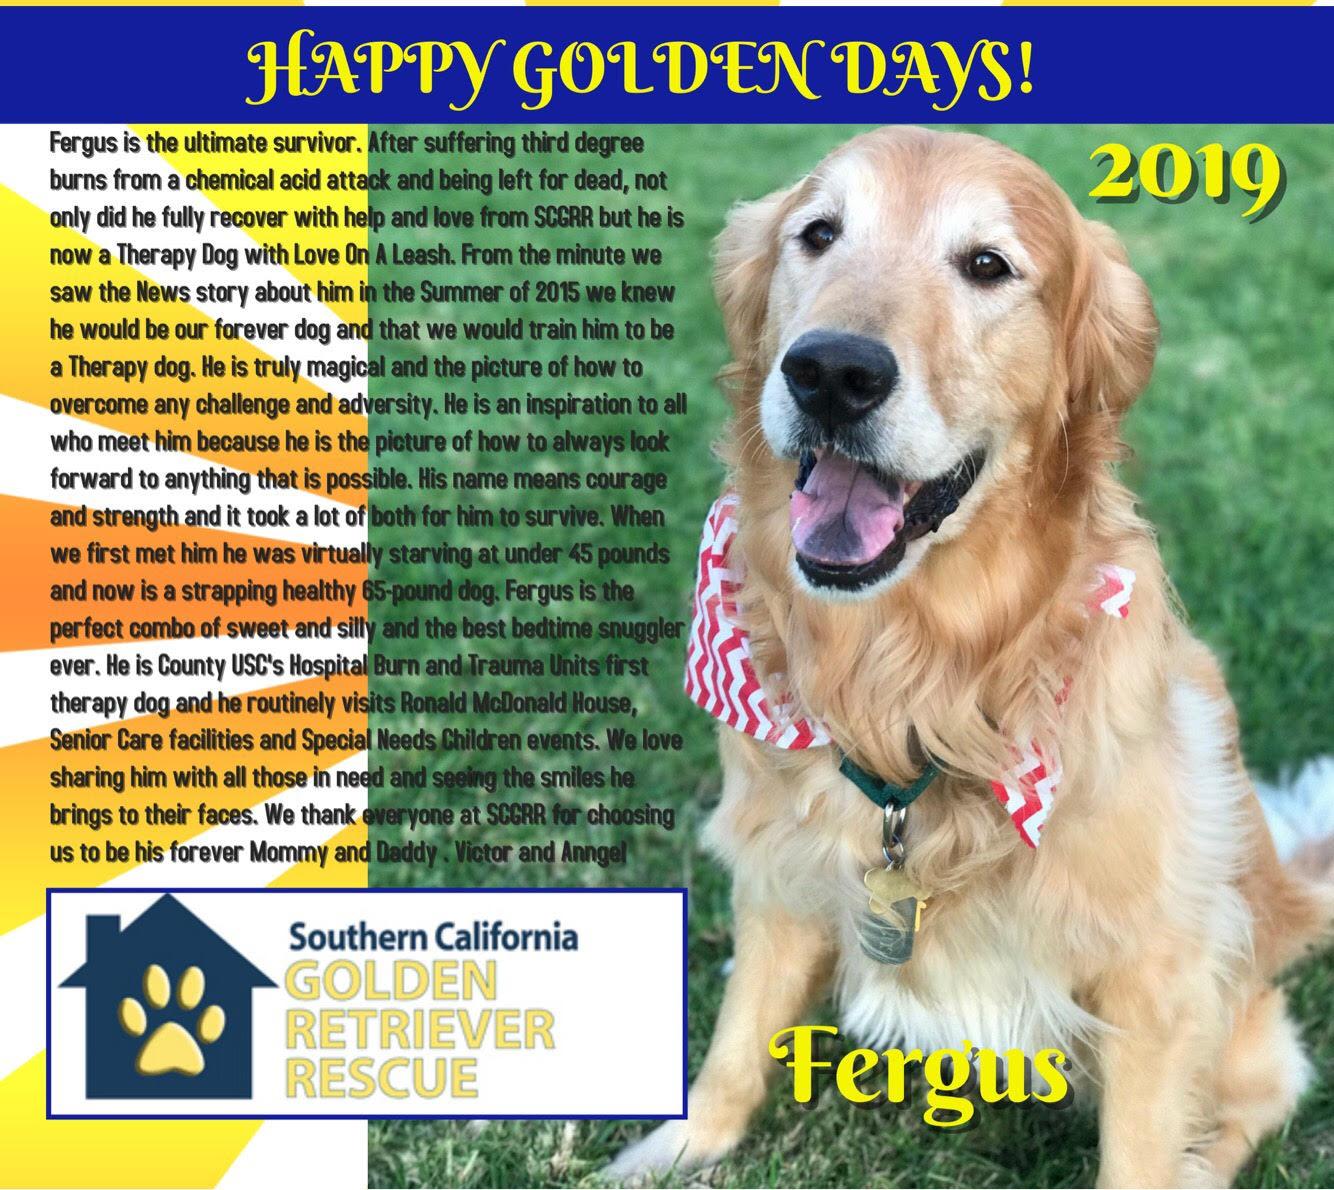 Southern California Golden Retriever Rescue Finding Loving